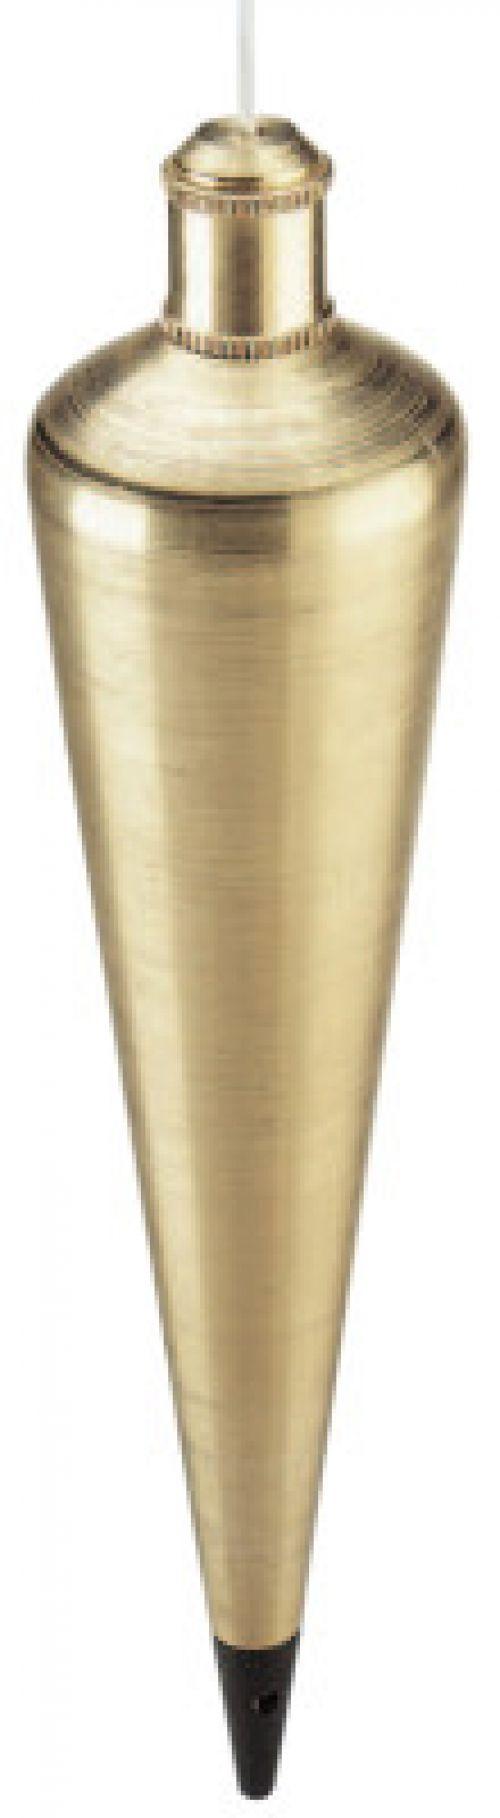 EMPIRE LEVEL Plumb Bobs, 16 oz, Corrosion Resistant Steel/Brass